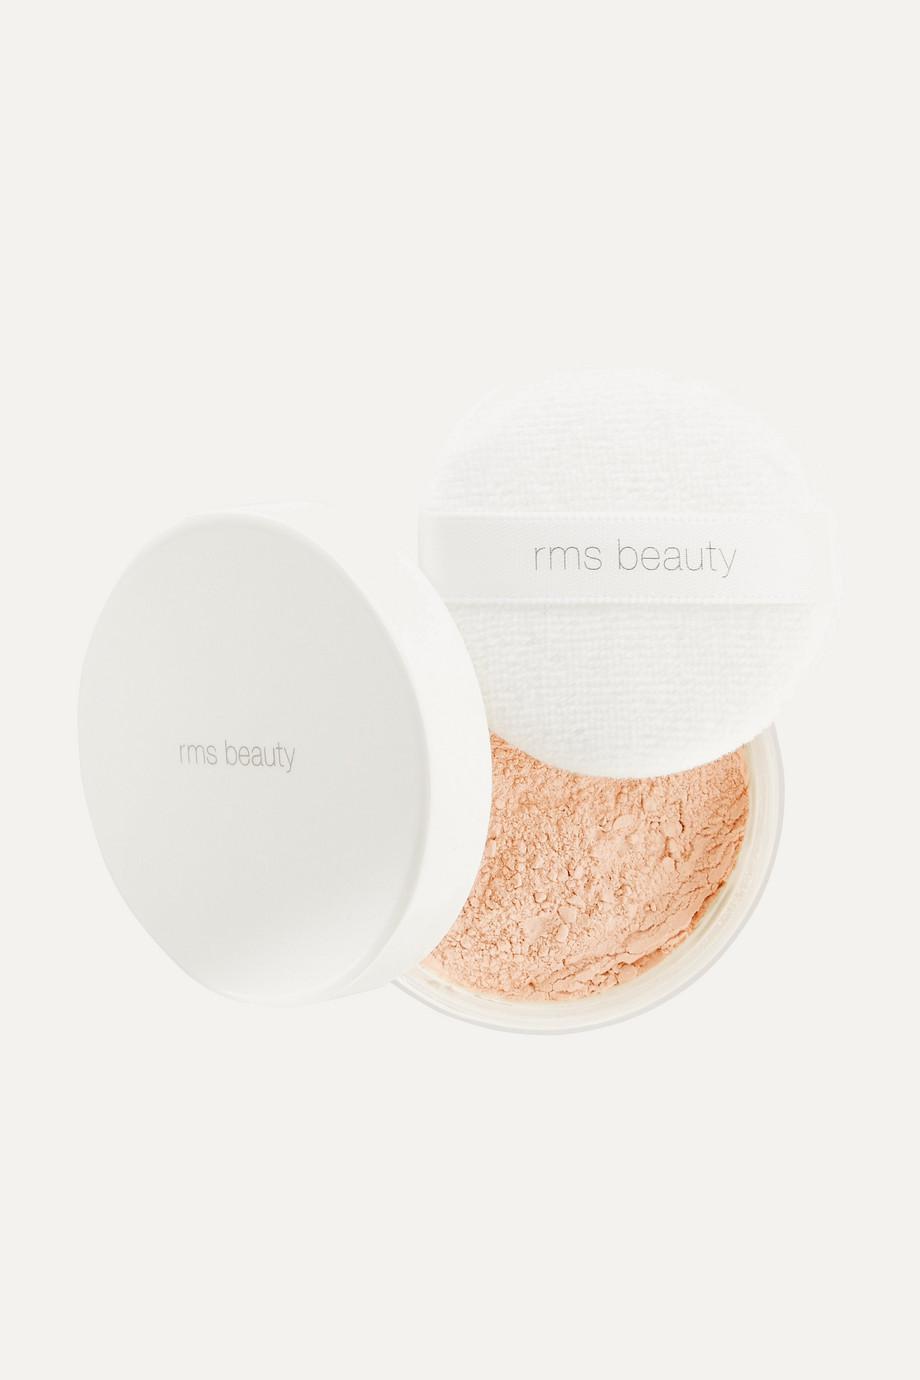 "RMS Beauty Tinted ""Un"" Powder – Shade 2-3 – Getönter Puder"